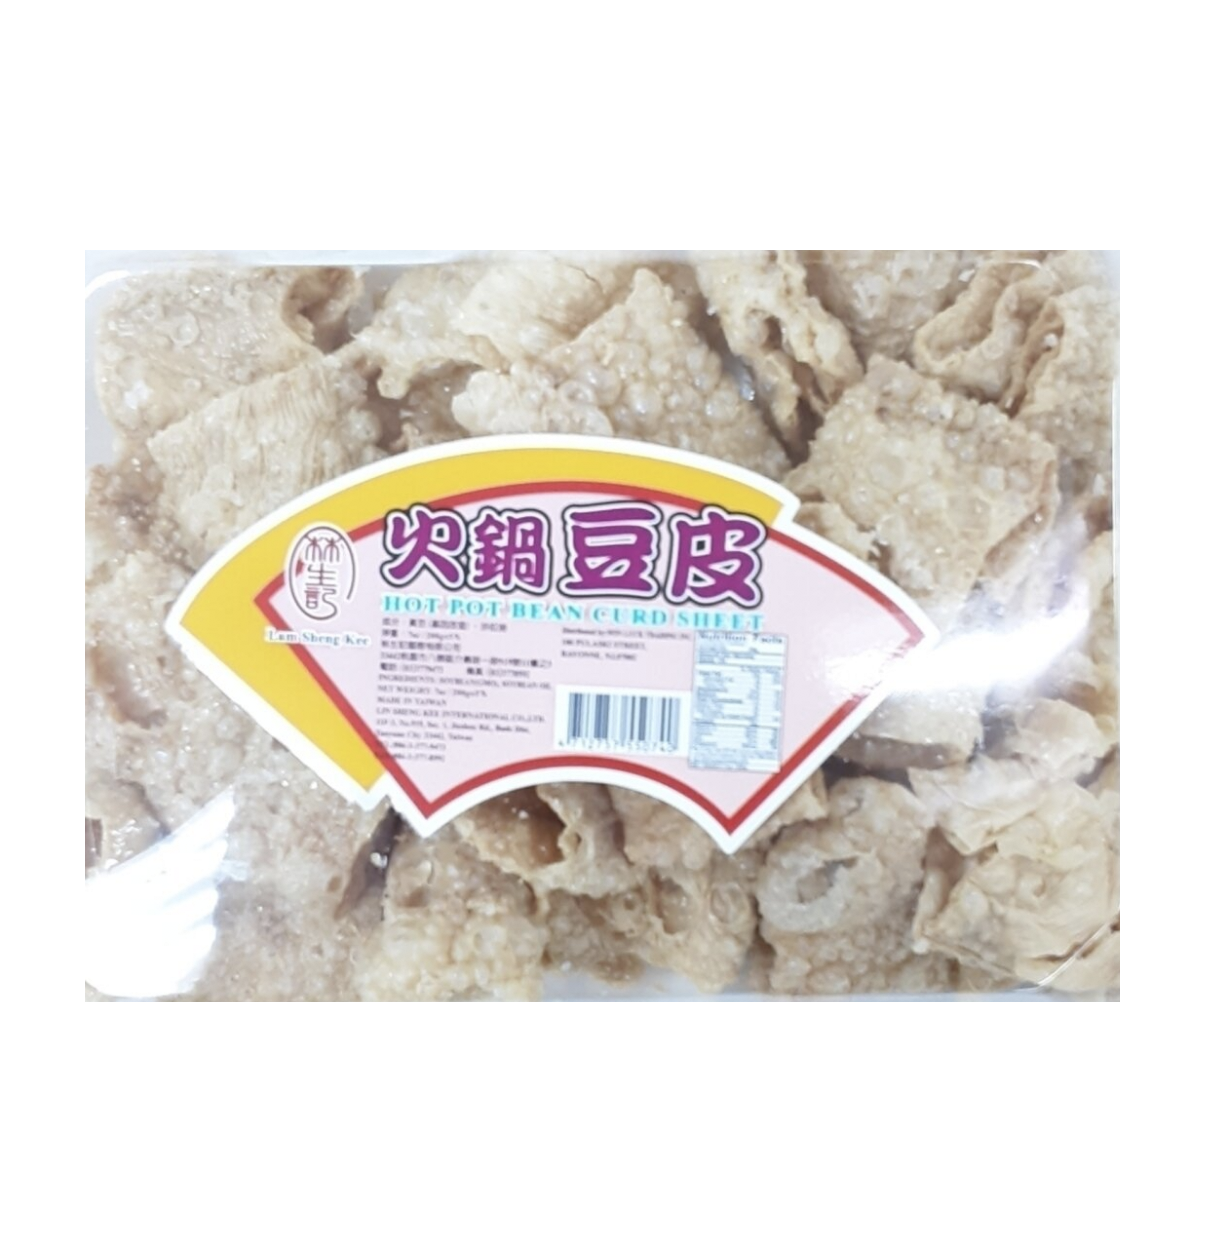 林生记火锅豆皮 ~200g(7oz) Lam Sheng Kee HOT POT BEAN CURD SHEET 200g(7oz)